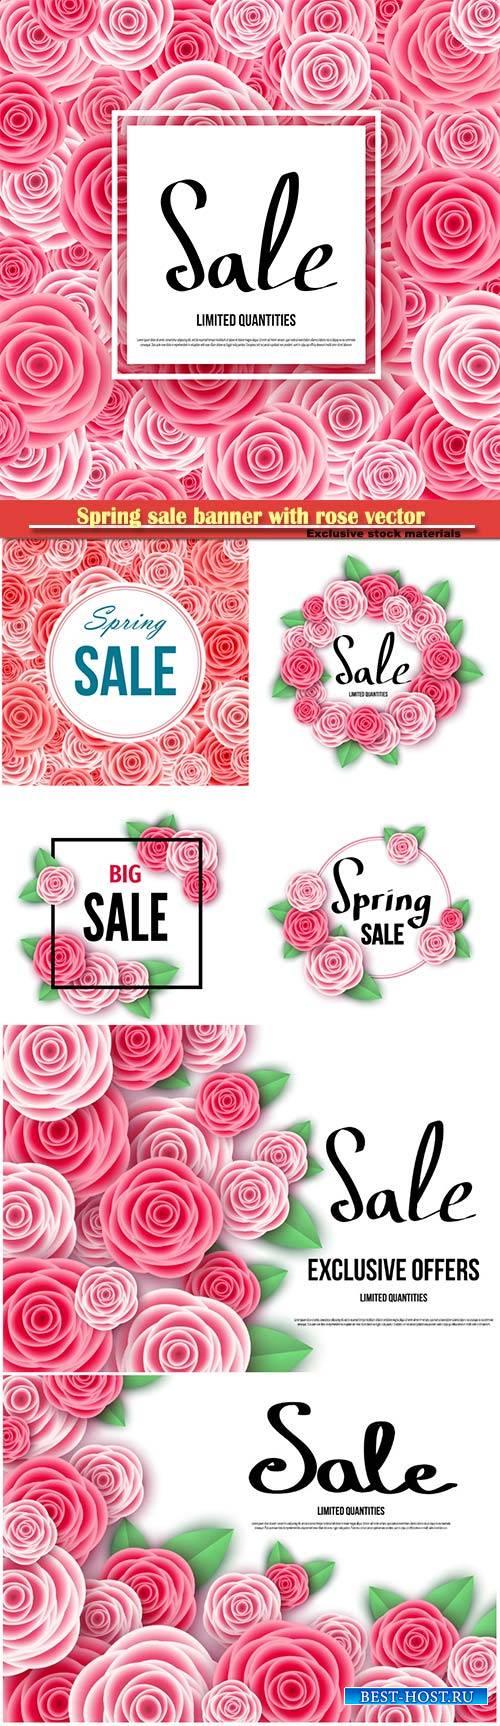 Spring sale banner with rose vector illustration